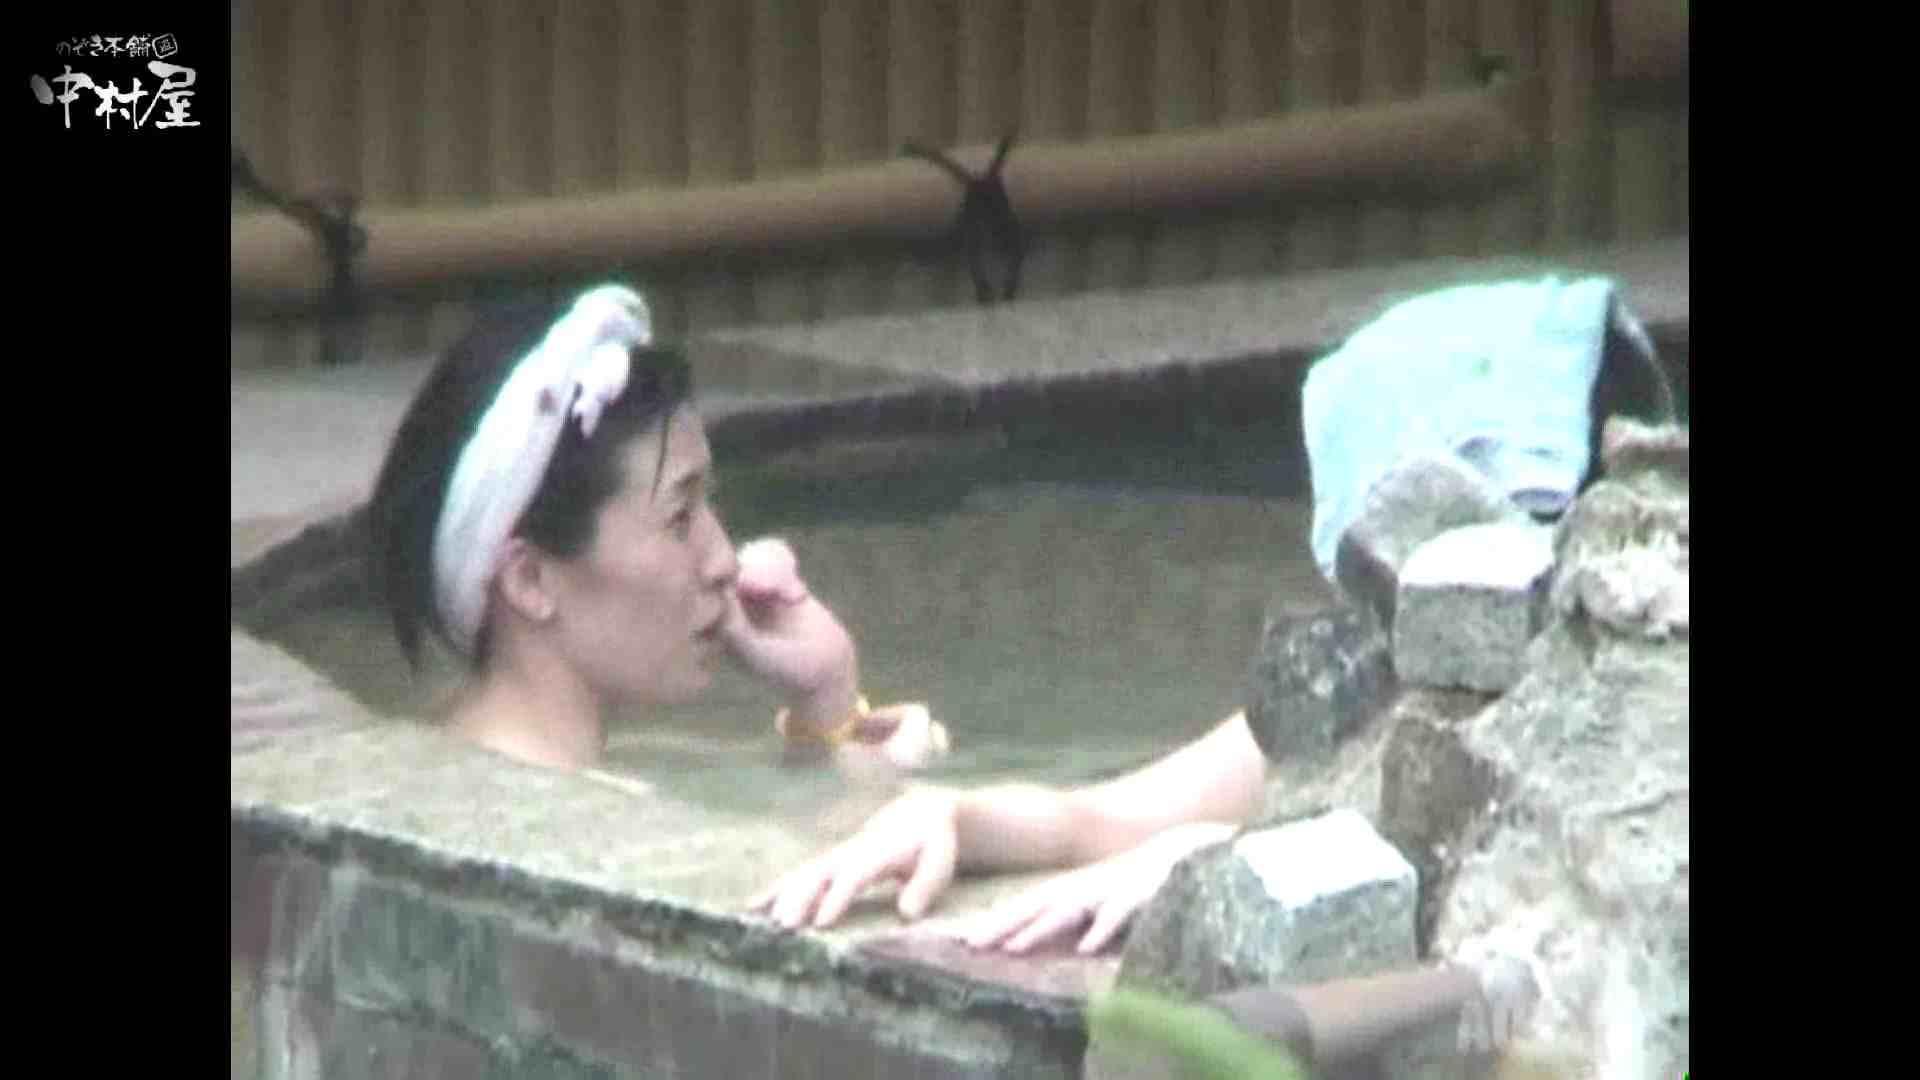 Aquaな露天風呂Vol.874潜入盗撮露天風呂十判湯 其の四 露天 オメコ動画キャプチャ 108画像 71